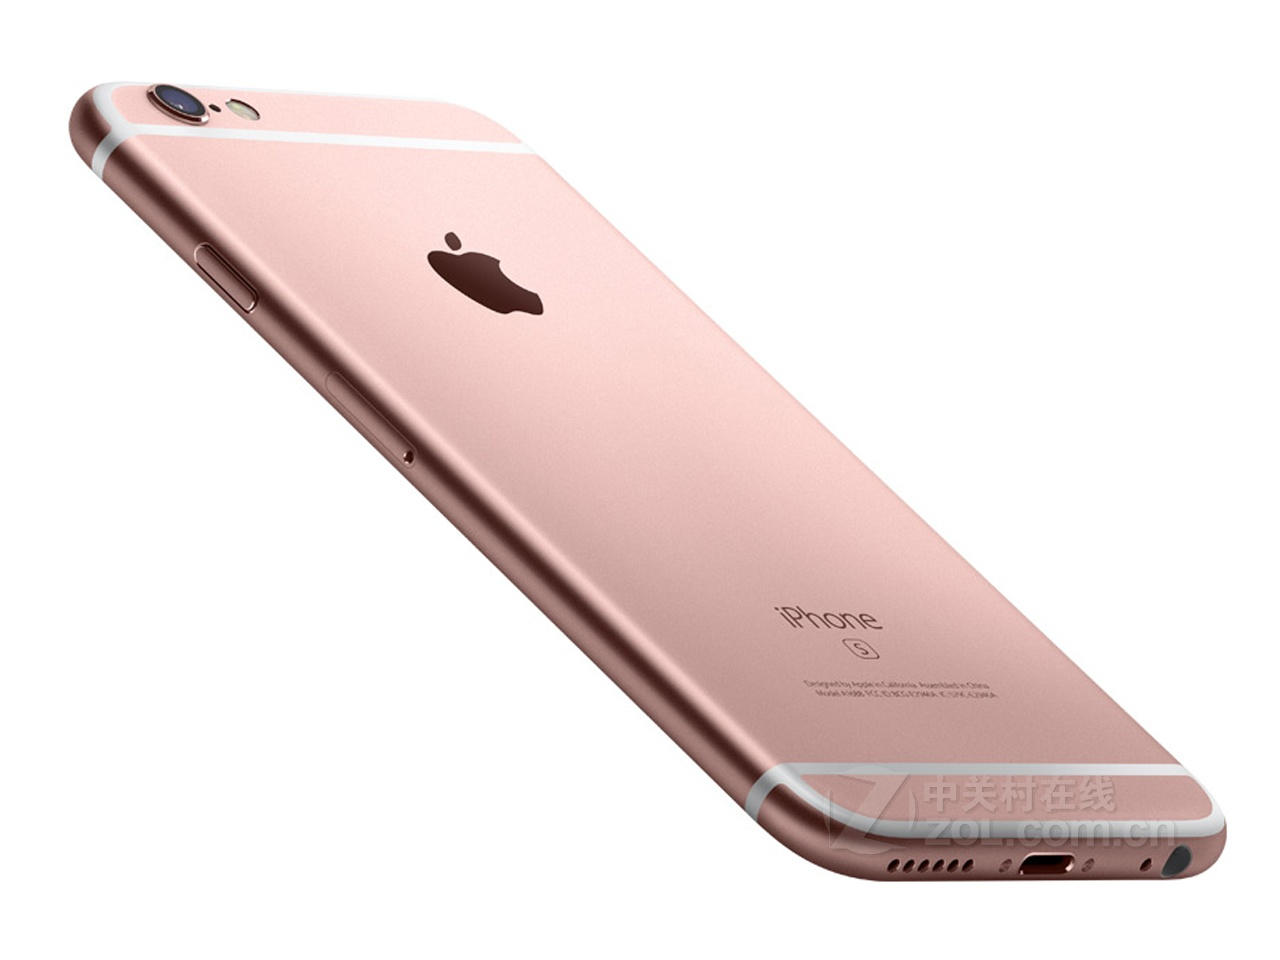 6S自发布开始就受到追捧。苹果iPhone 6S的特点无疑是3DTouch技术的加入,直接改变了iPhone的操作系统,基本是重新定义了触控屏幕的操作方式,使原有更平面的操作变得更立体了起来。目前该产品在商家渝州数码(可分期)双4G促销4099元,分期首付1000、月供222。有需要的朋友不妨关注一下。  苹果 iPhone 6S 苹果 iPhone 6S在机身正面依旧是4.